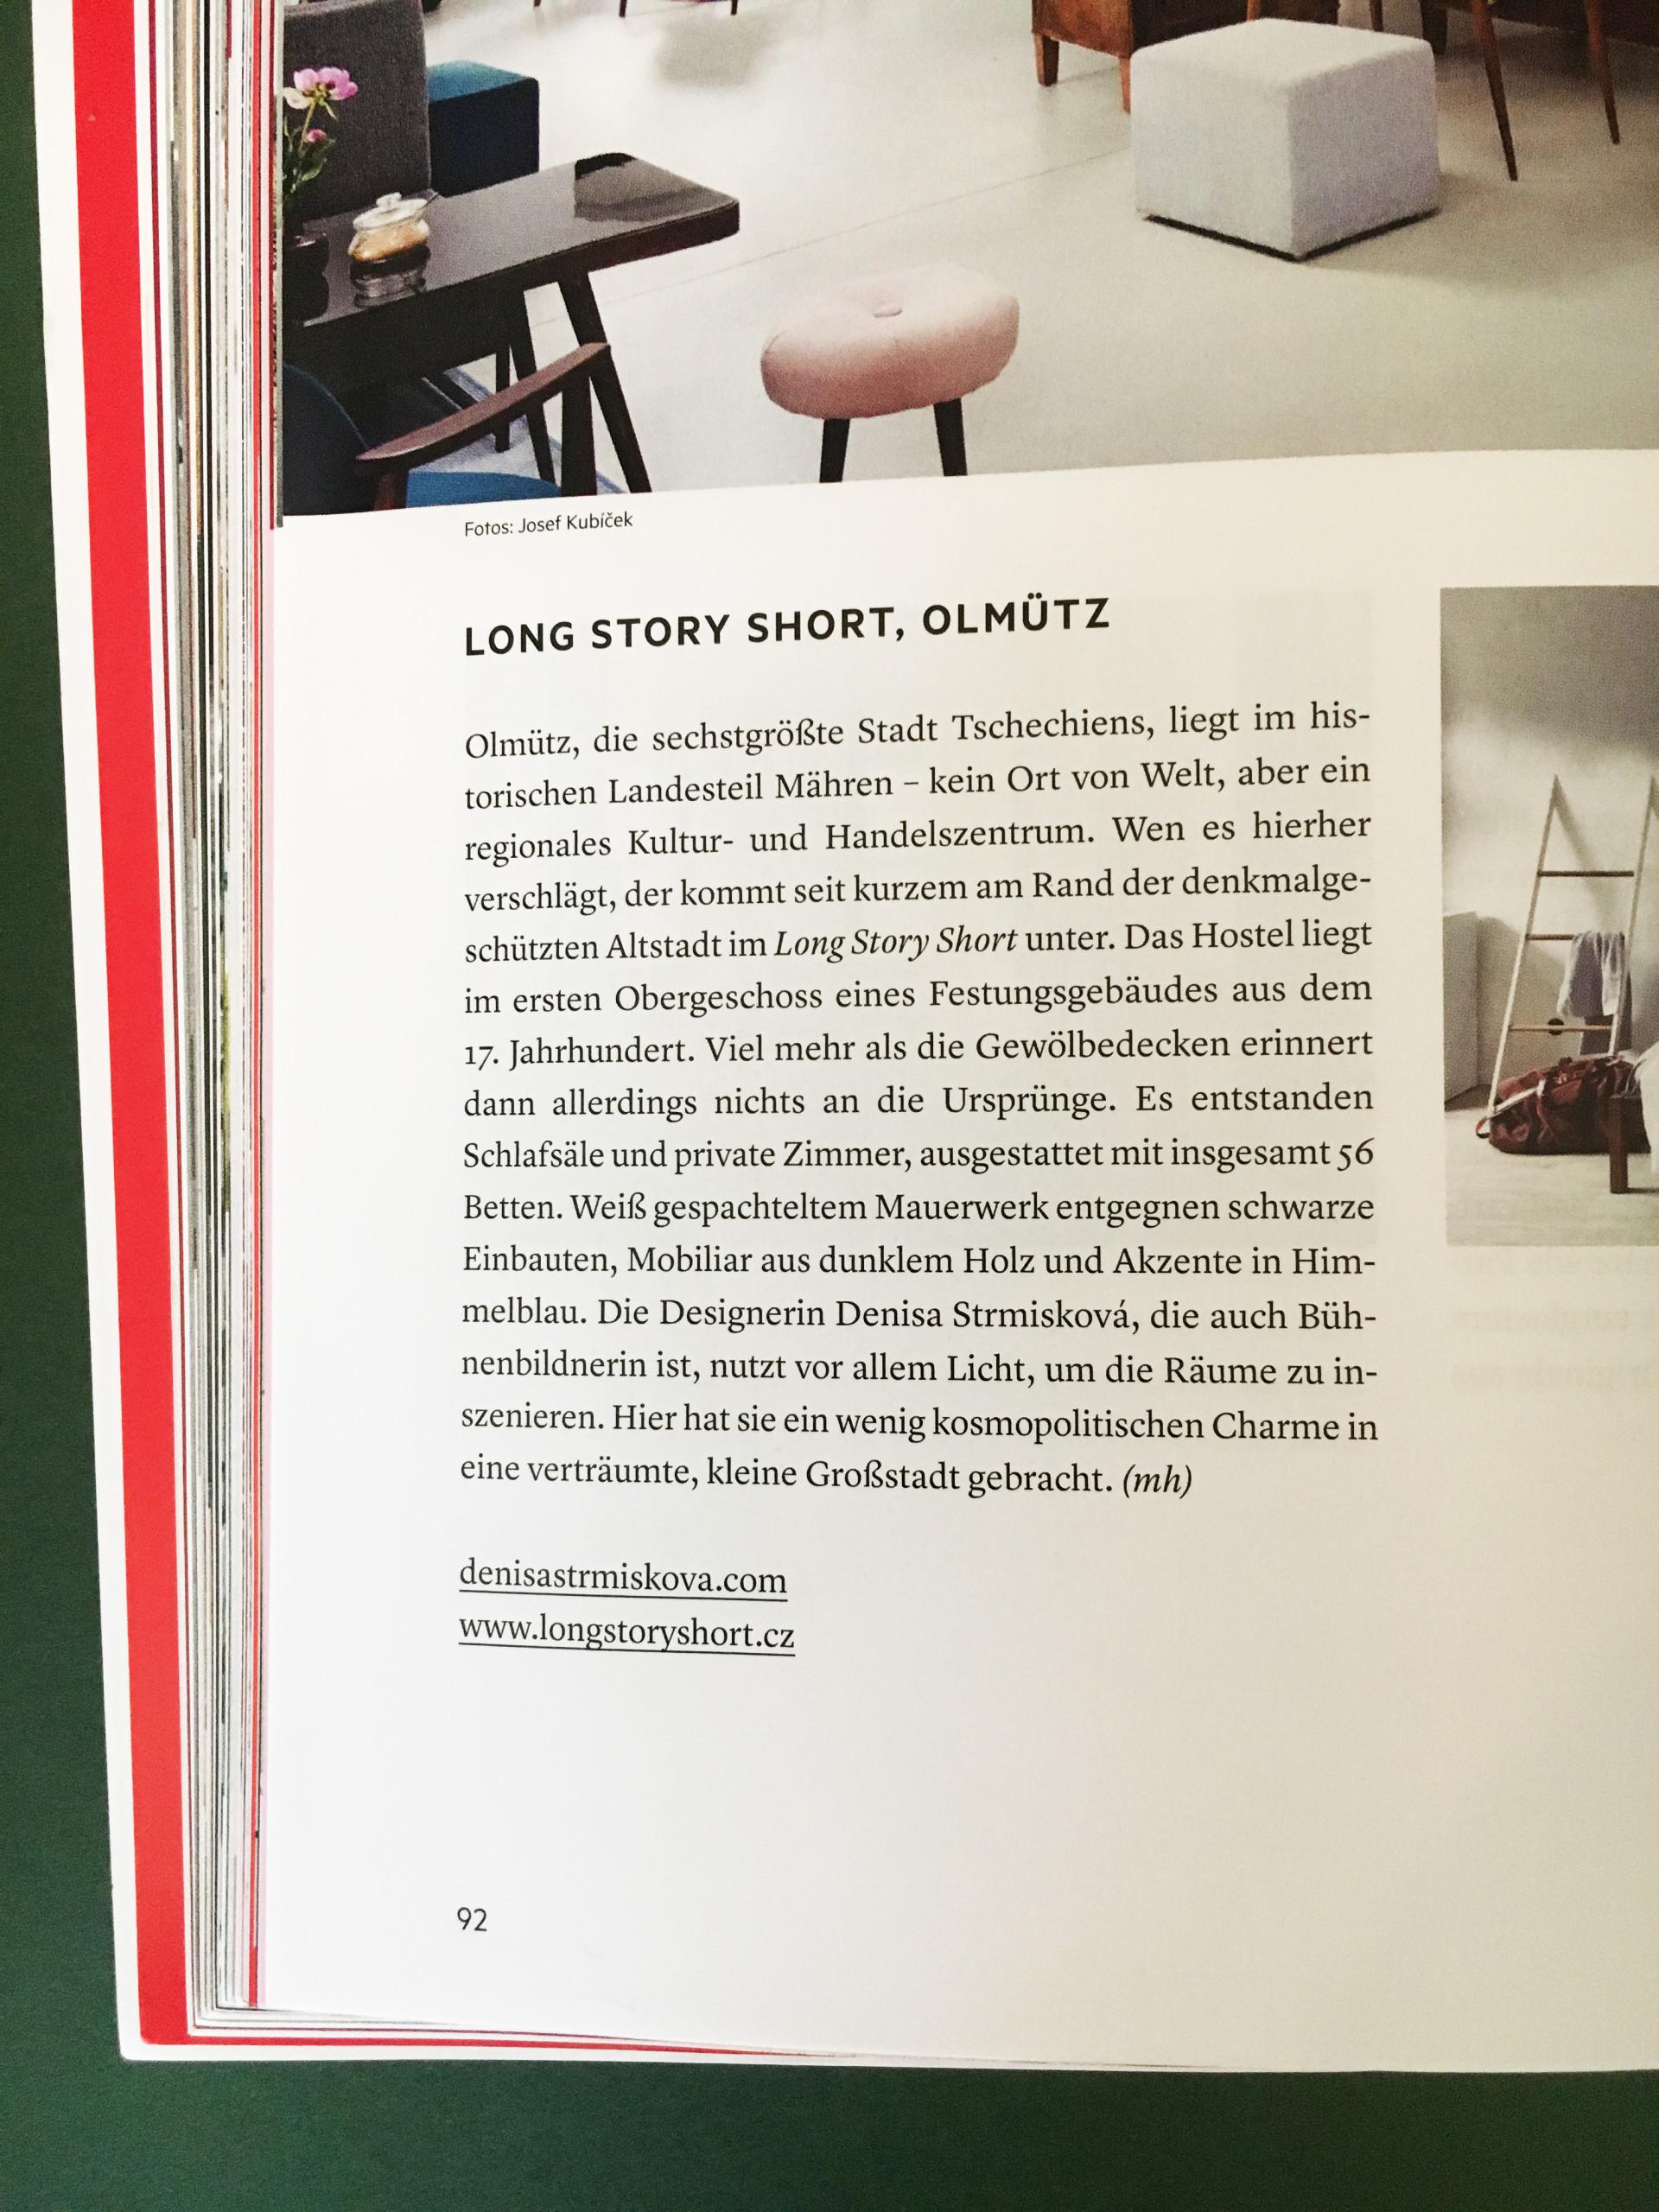 Denisa Strmiskova Studio | spatial design DEAR 4/2017